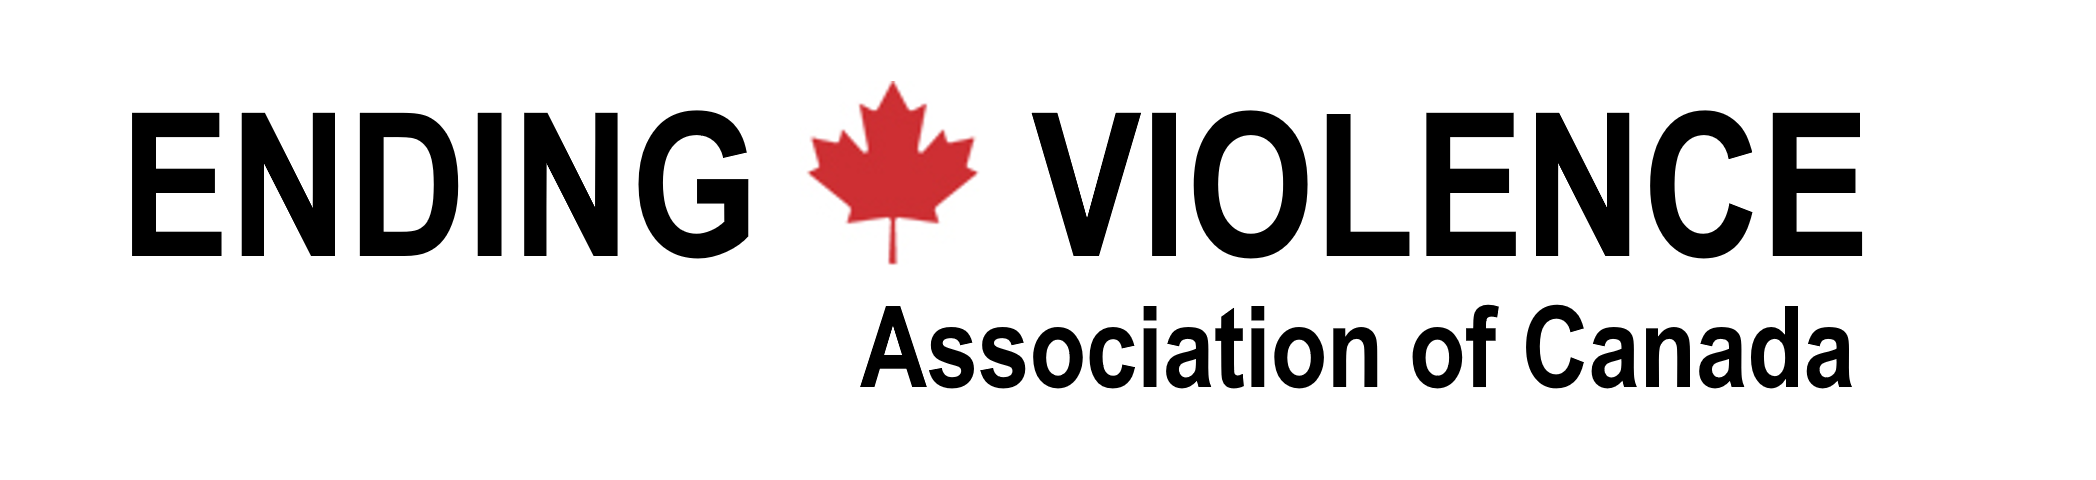 Ending Violence Association of Canada